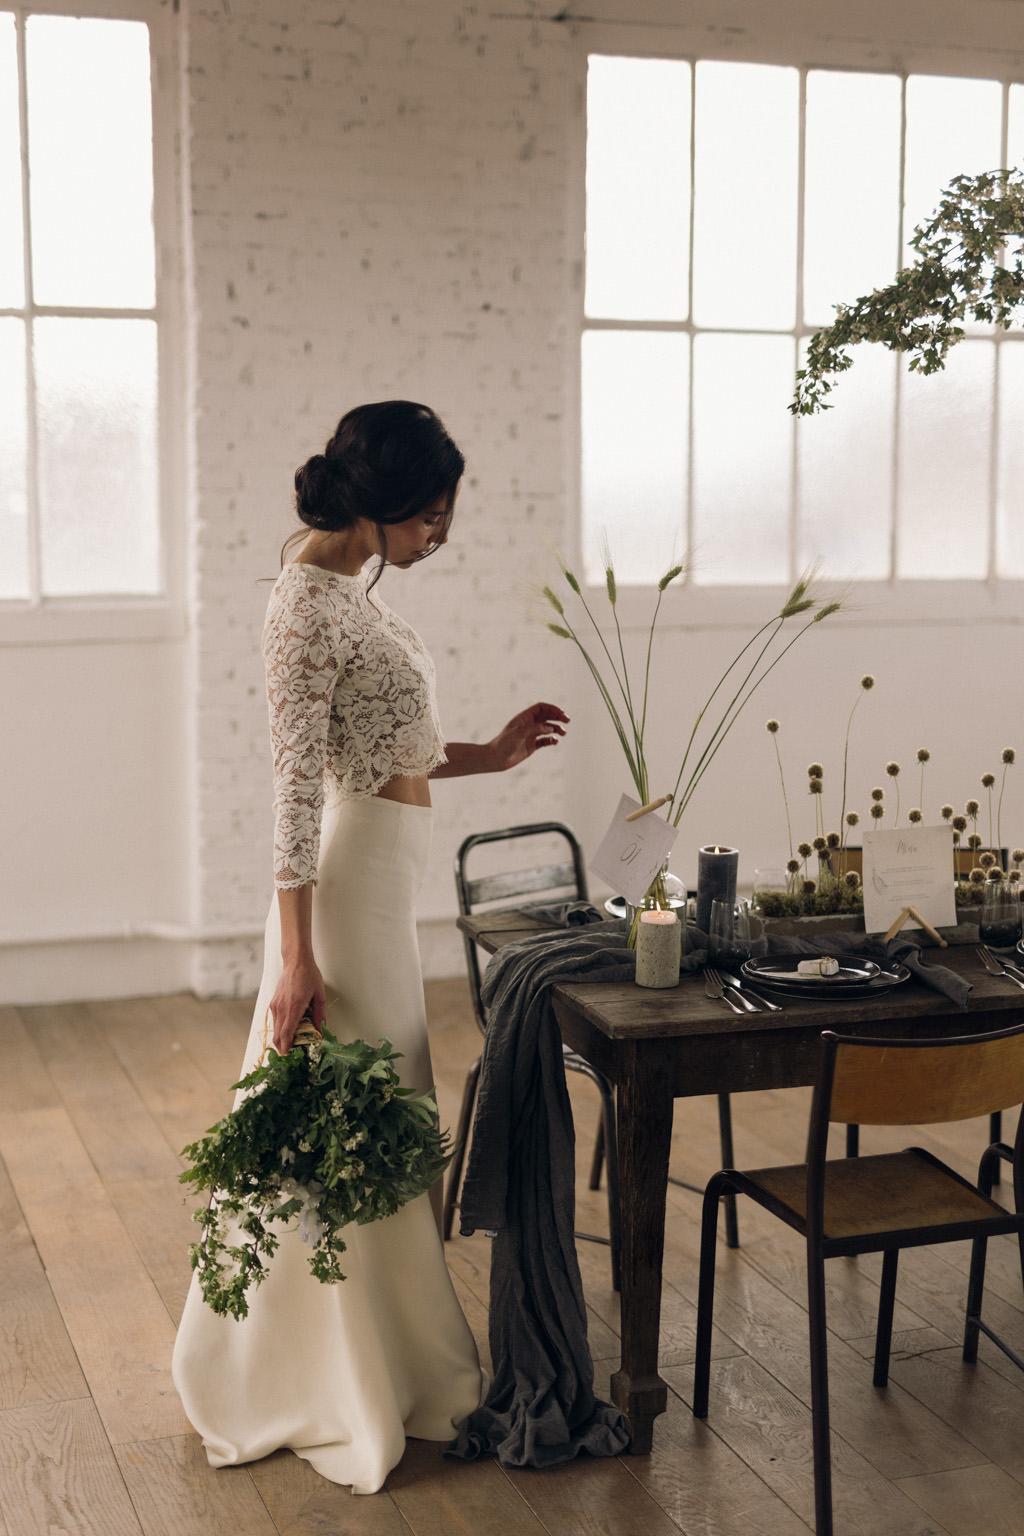 Un mariage végétal par Artis événement - Photographe mariage Paris Lika Banshoya